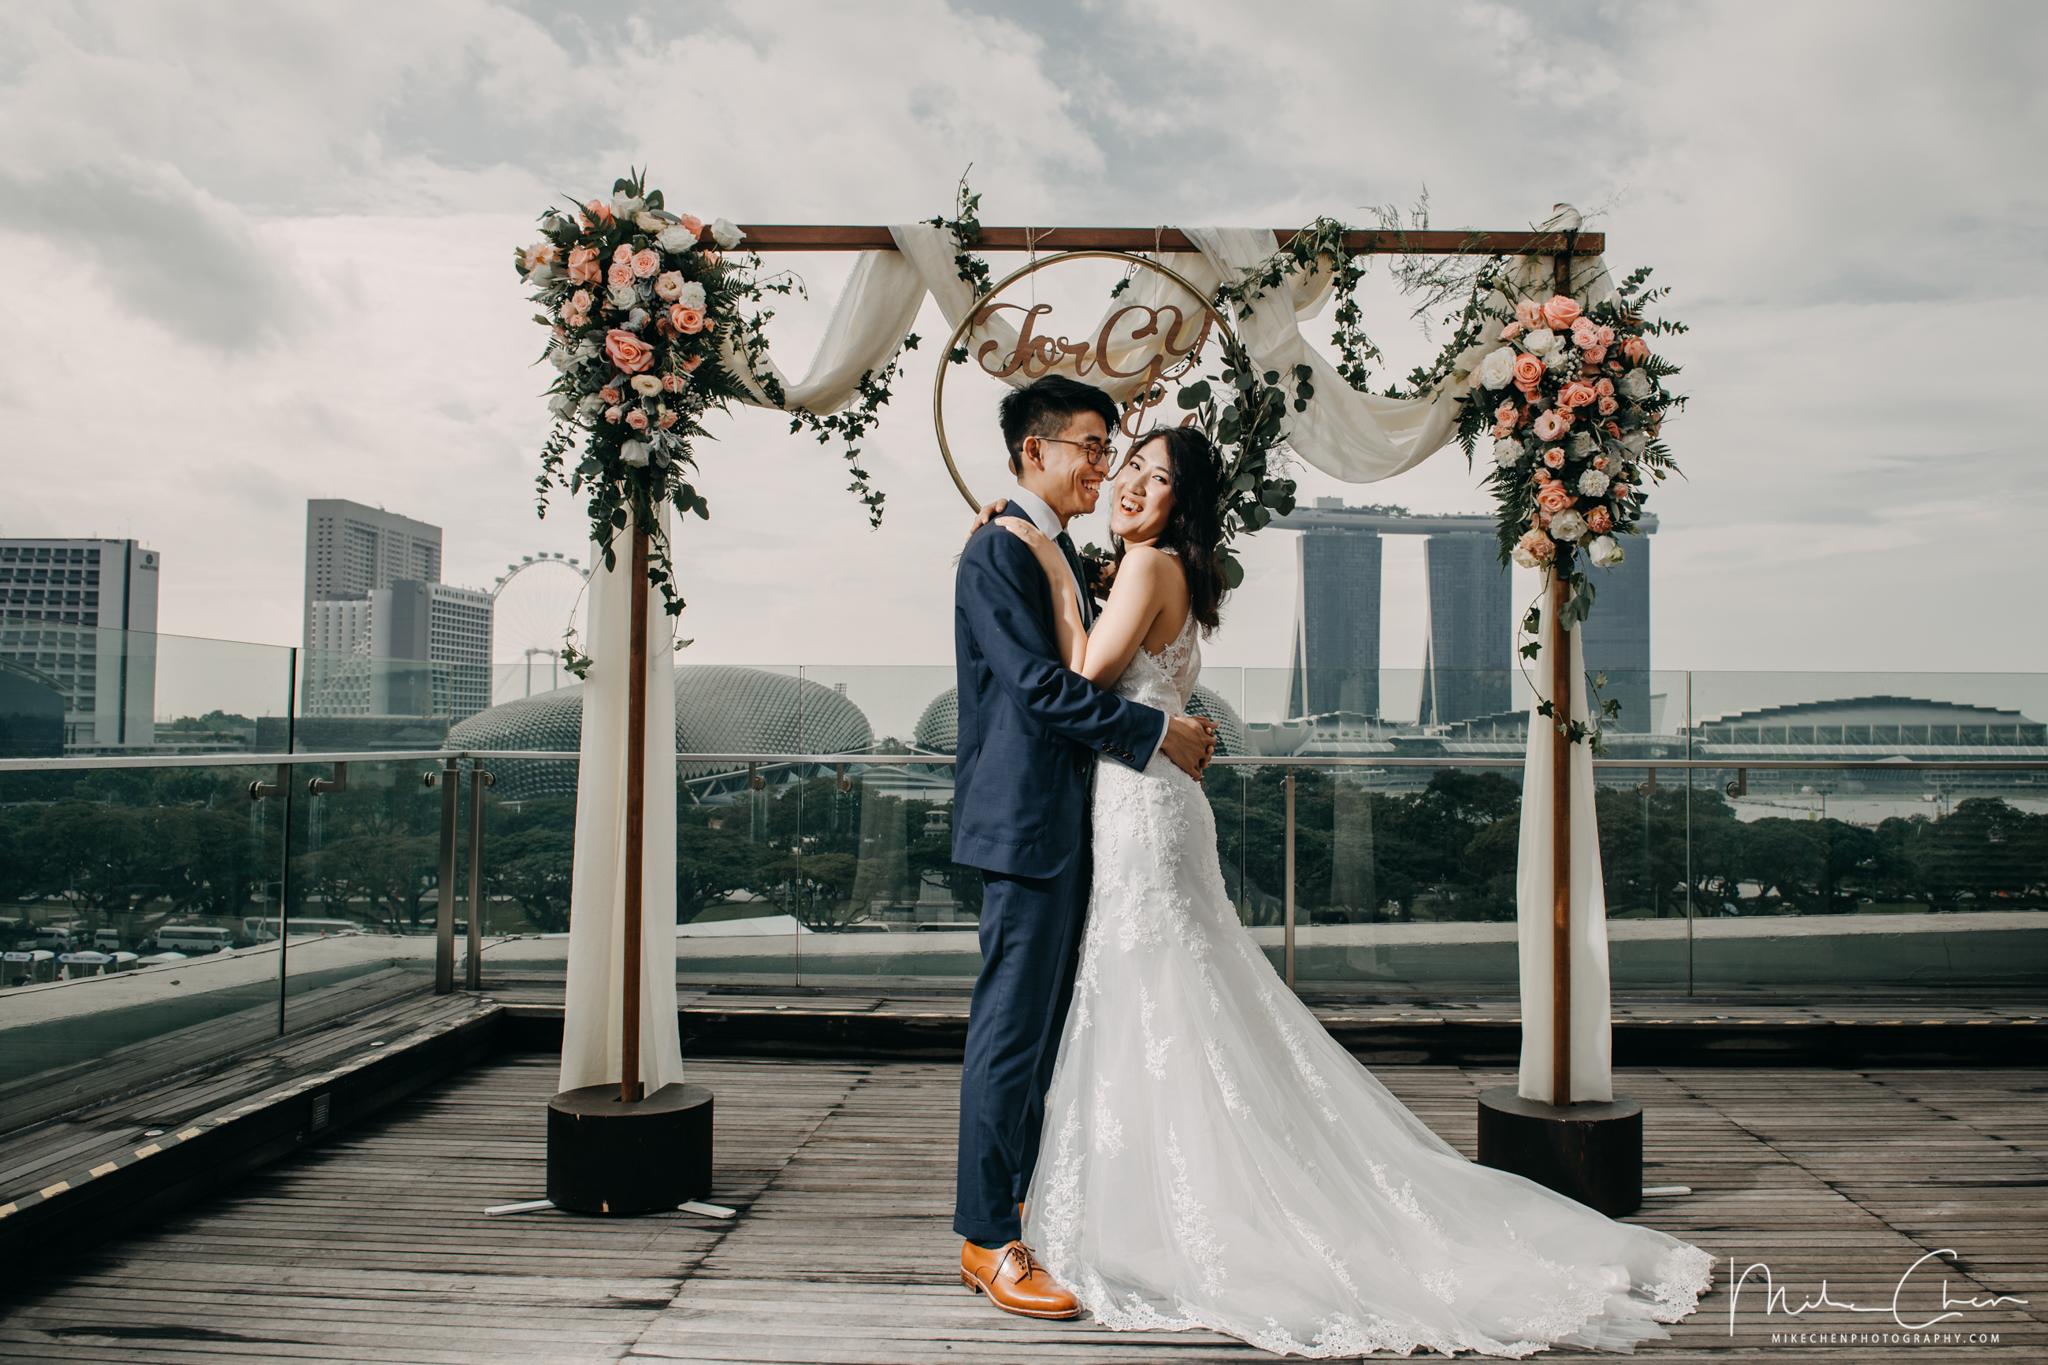 Cheap wedding photography singapore 20 Discount Wedding Photography Packages - SingaporeBrides